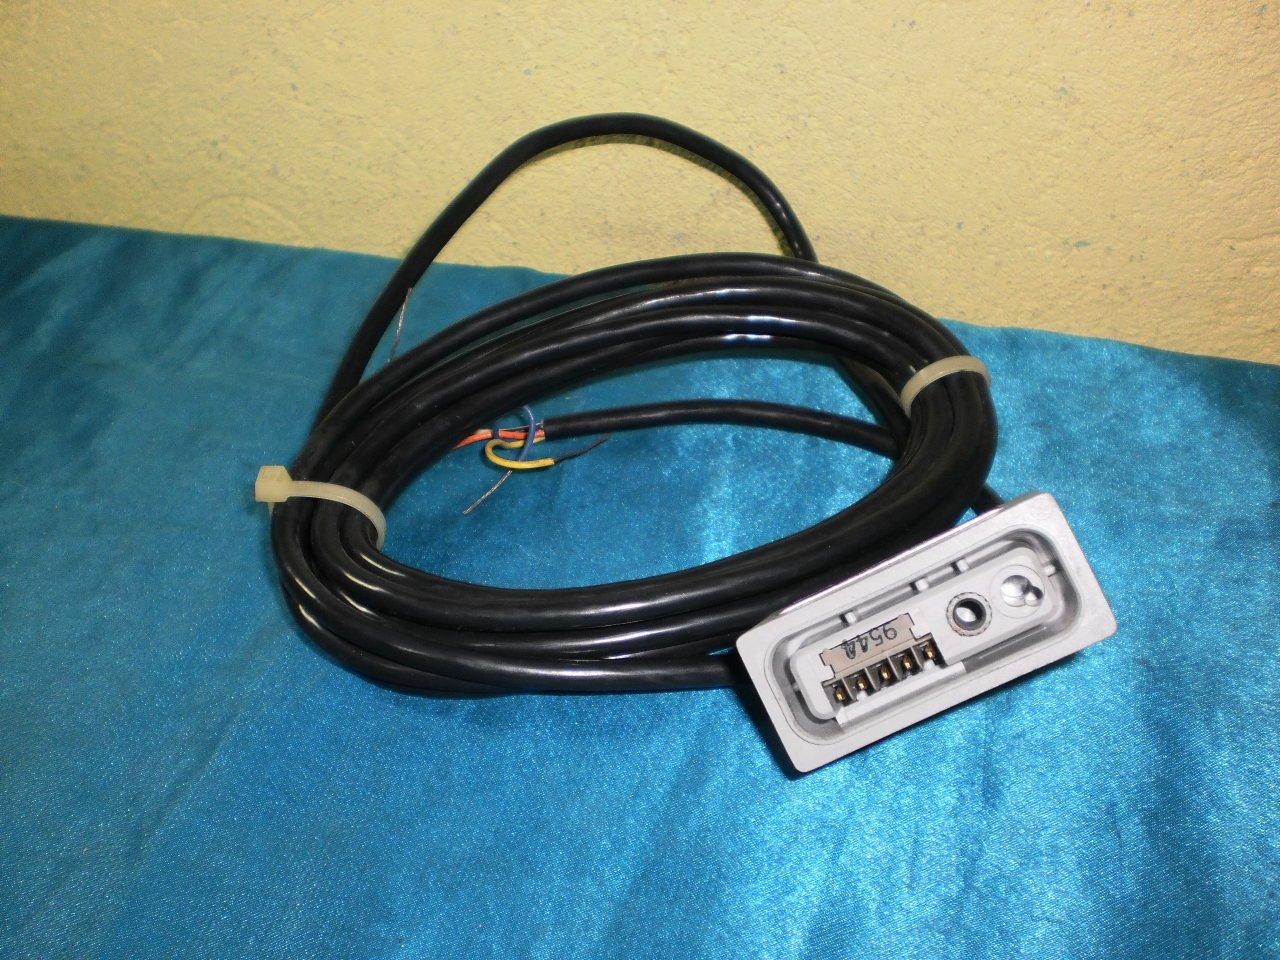 Allen Bradley 42LCB-5000 Photo Switch Cable Base